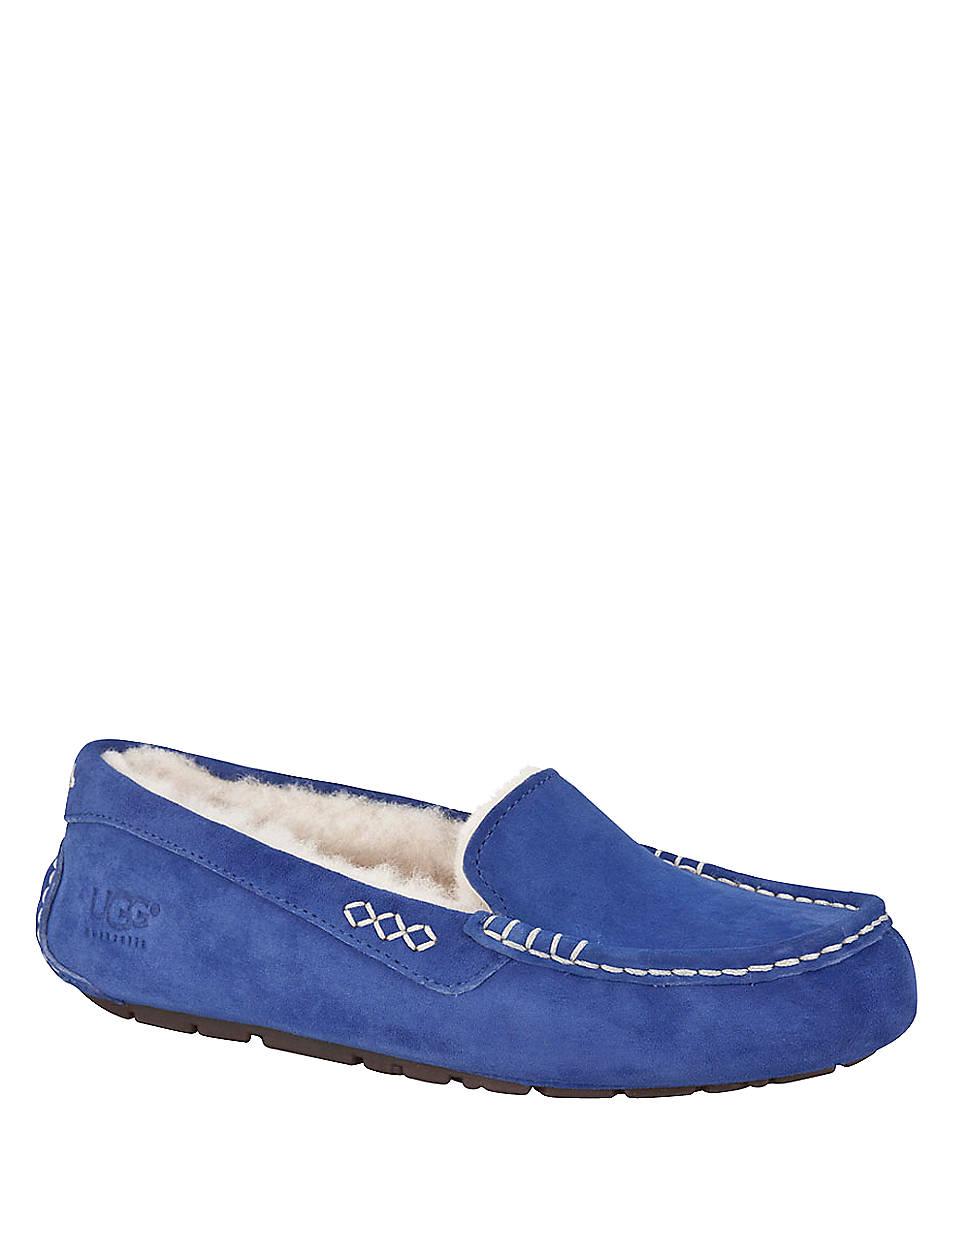 Magnanni Shoes Australia